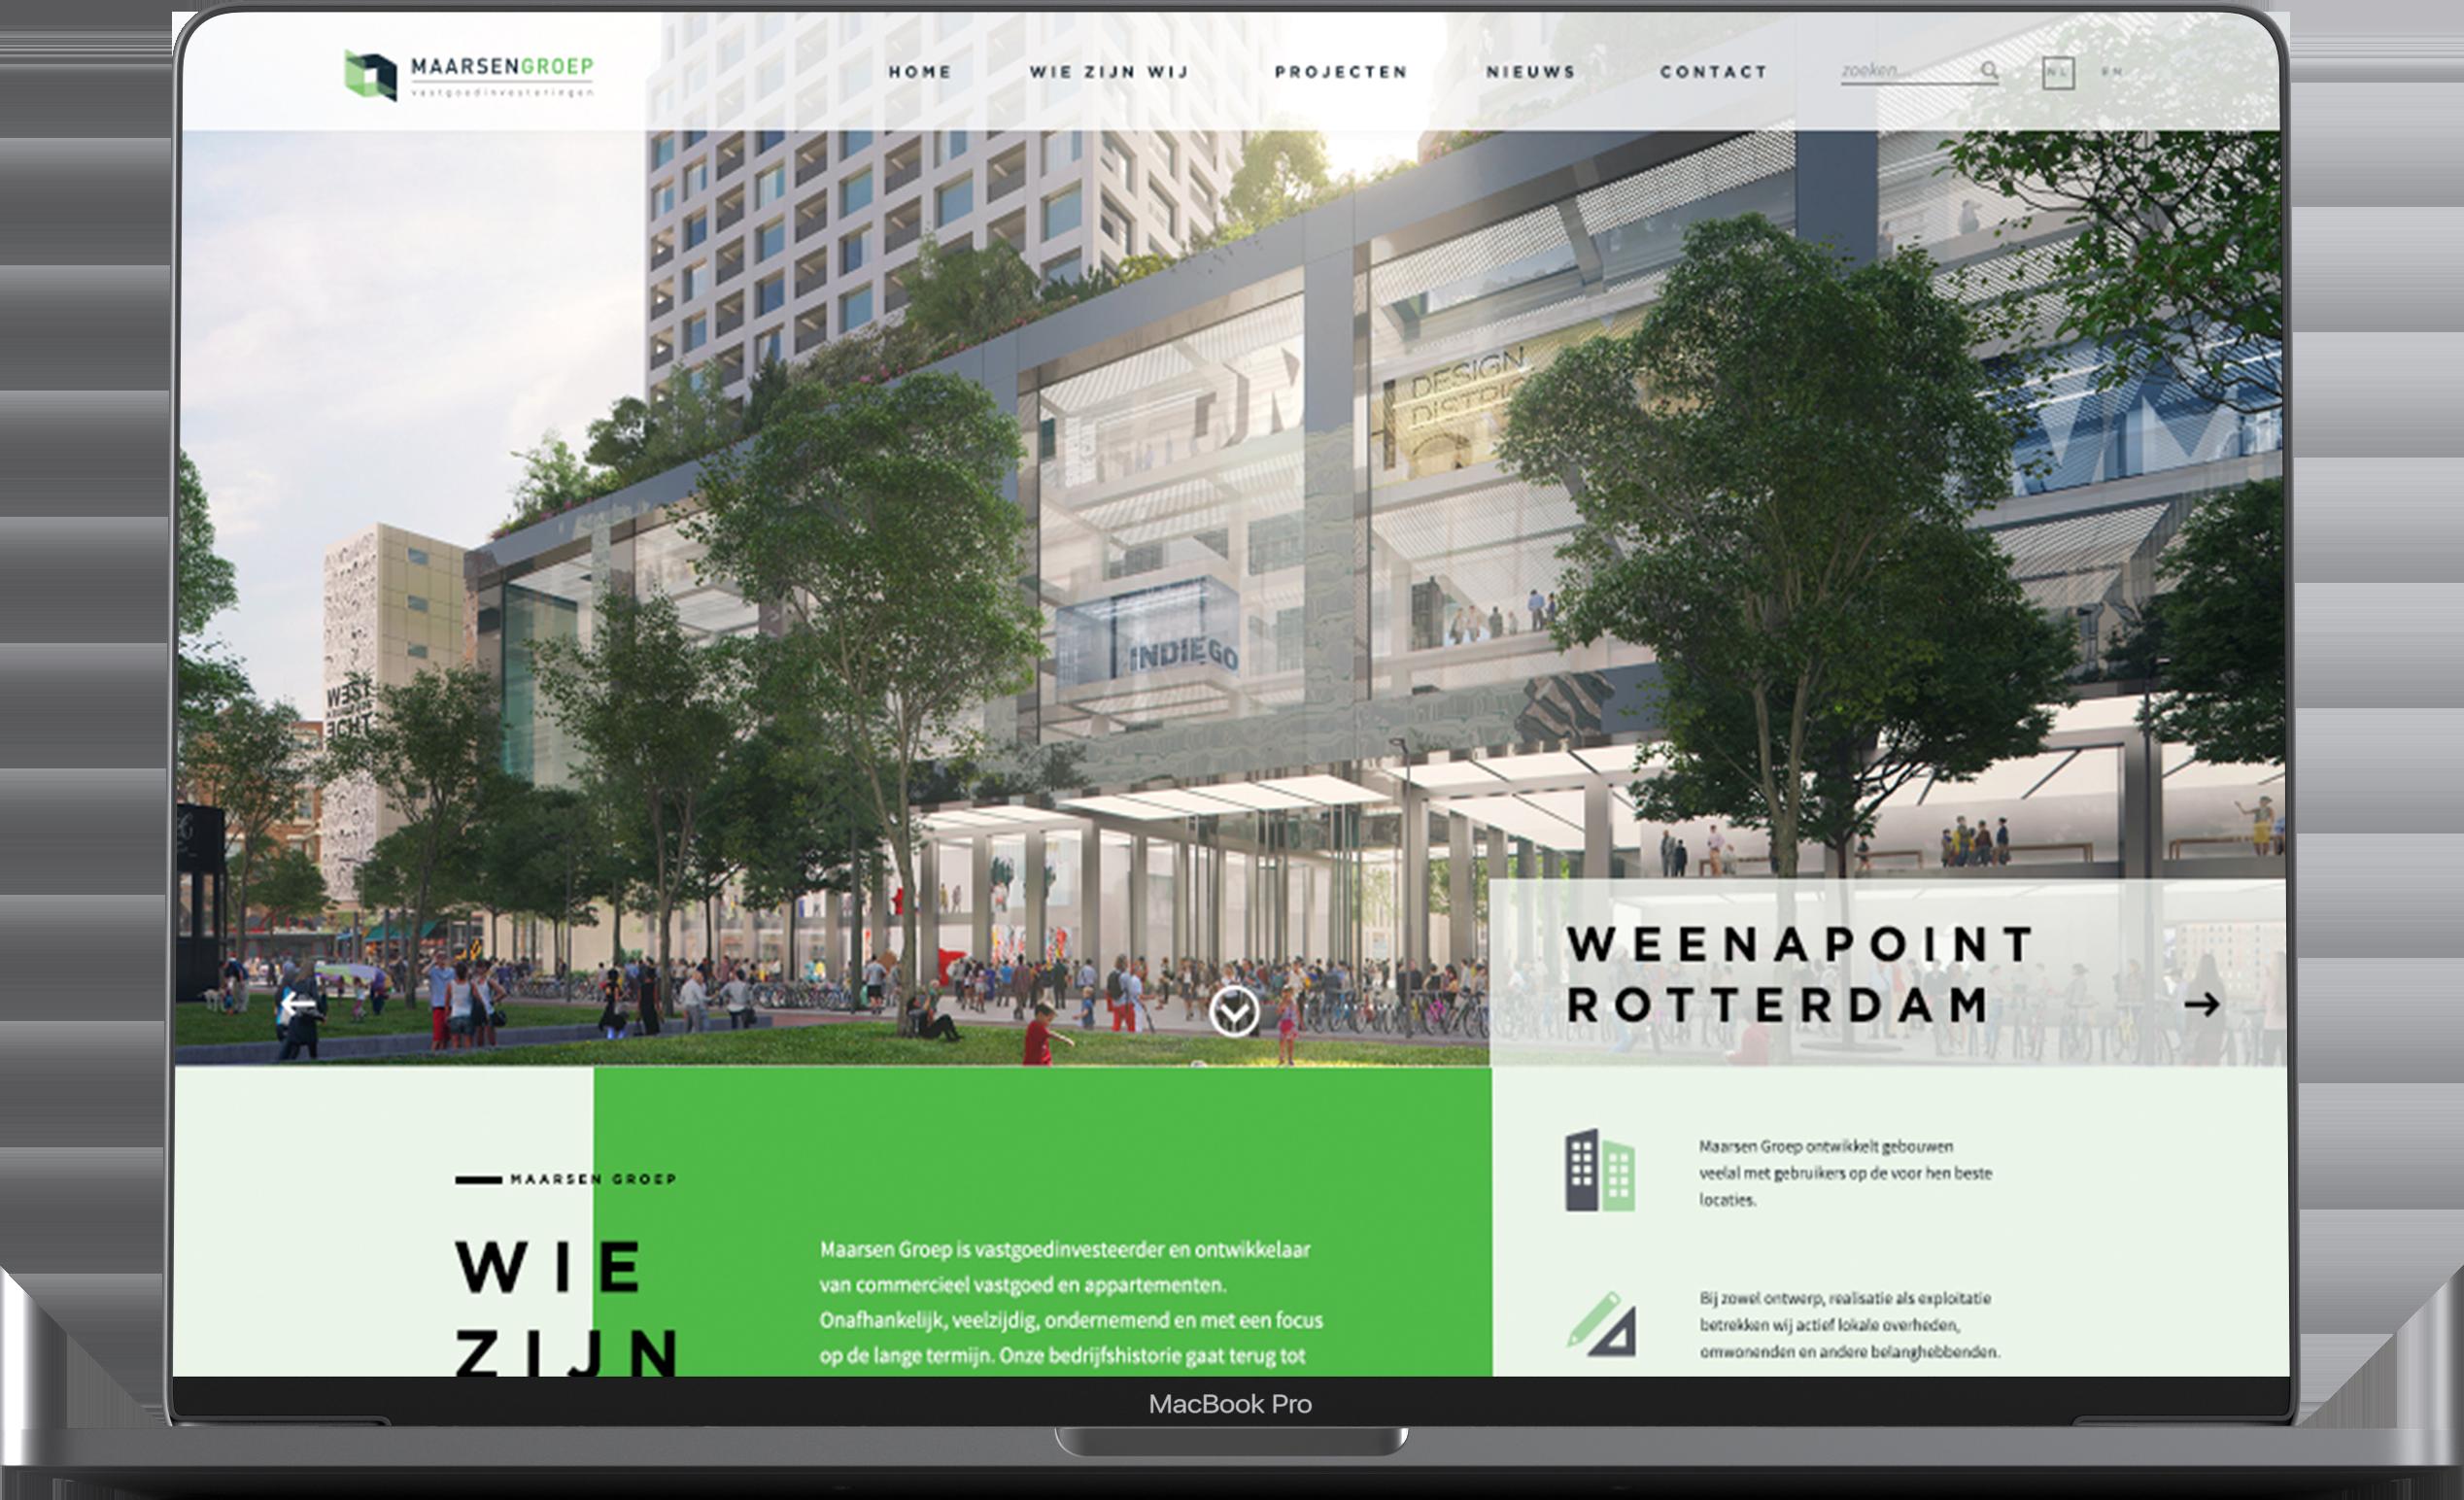 Maarsen Groep webdesign